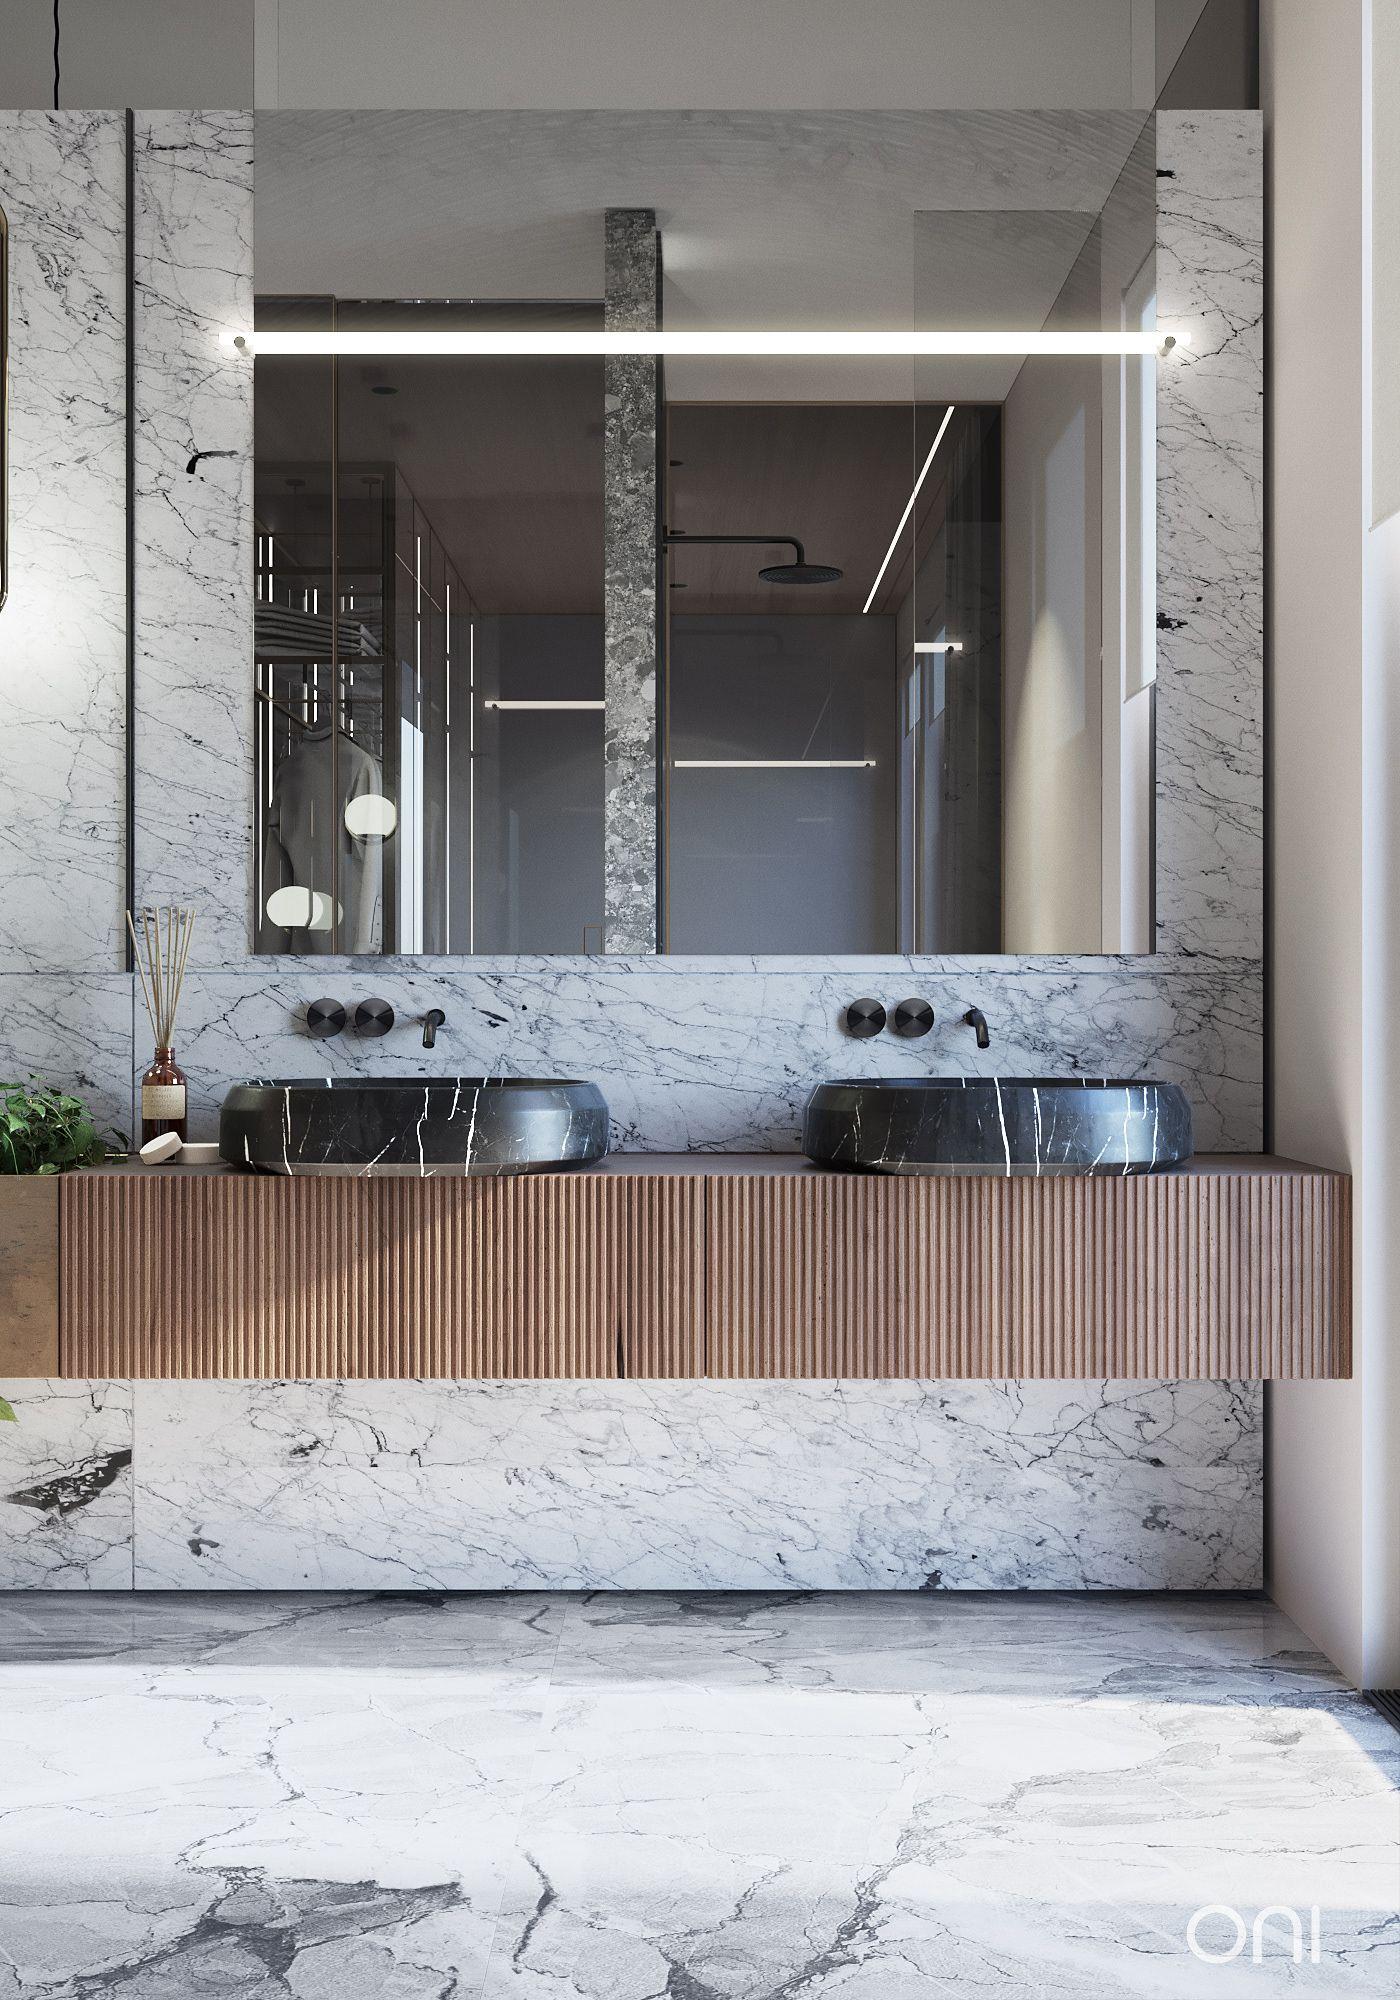 Contrast bathroom ideas in pinterest bathtub and interior also rh